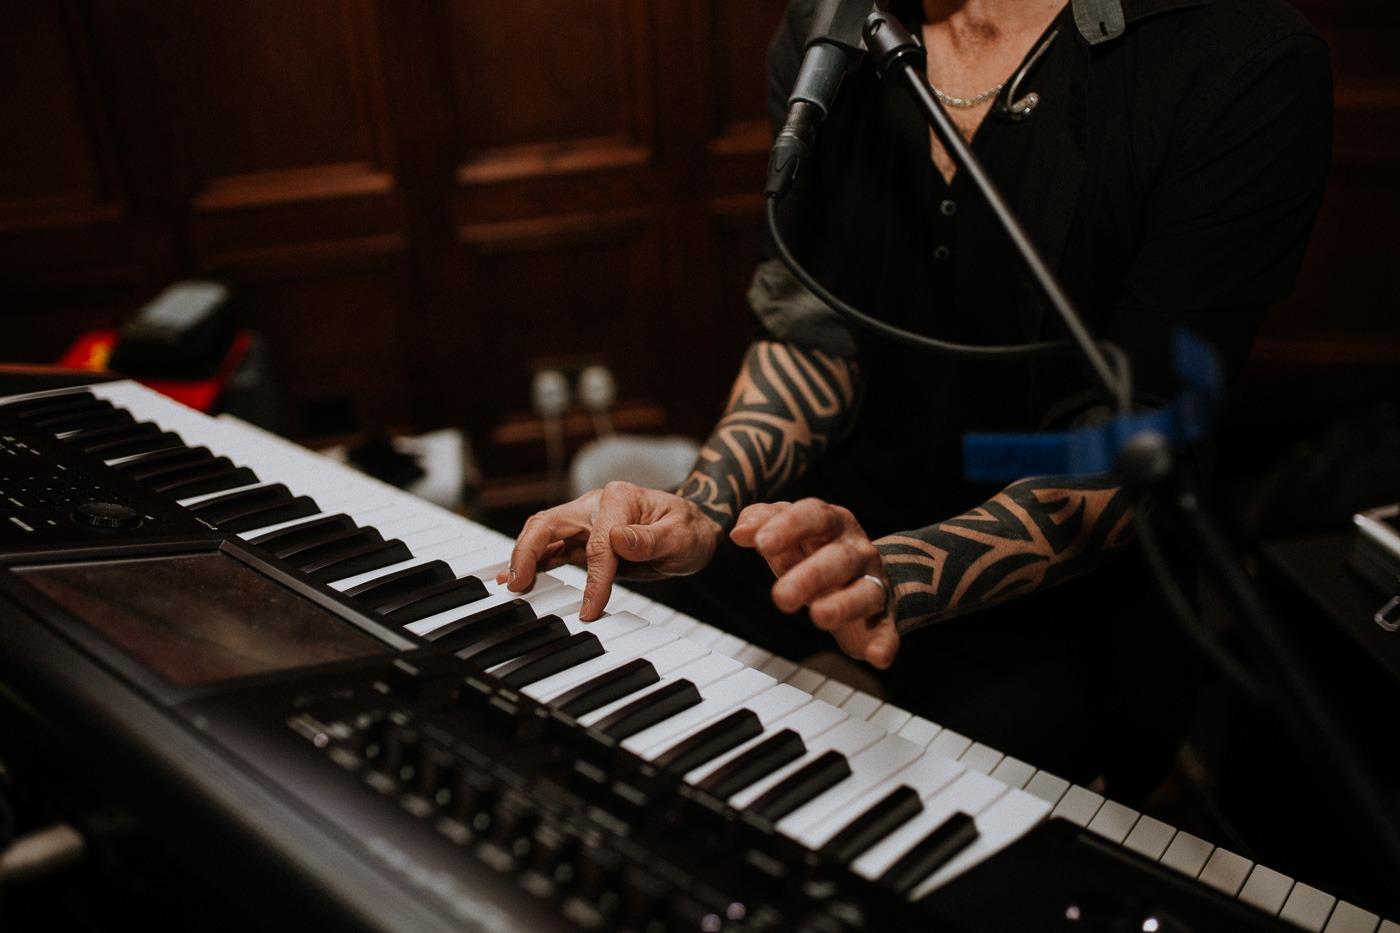 A man sitting on a piano keyboard